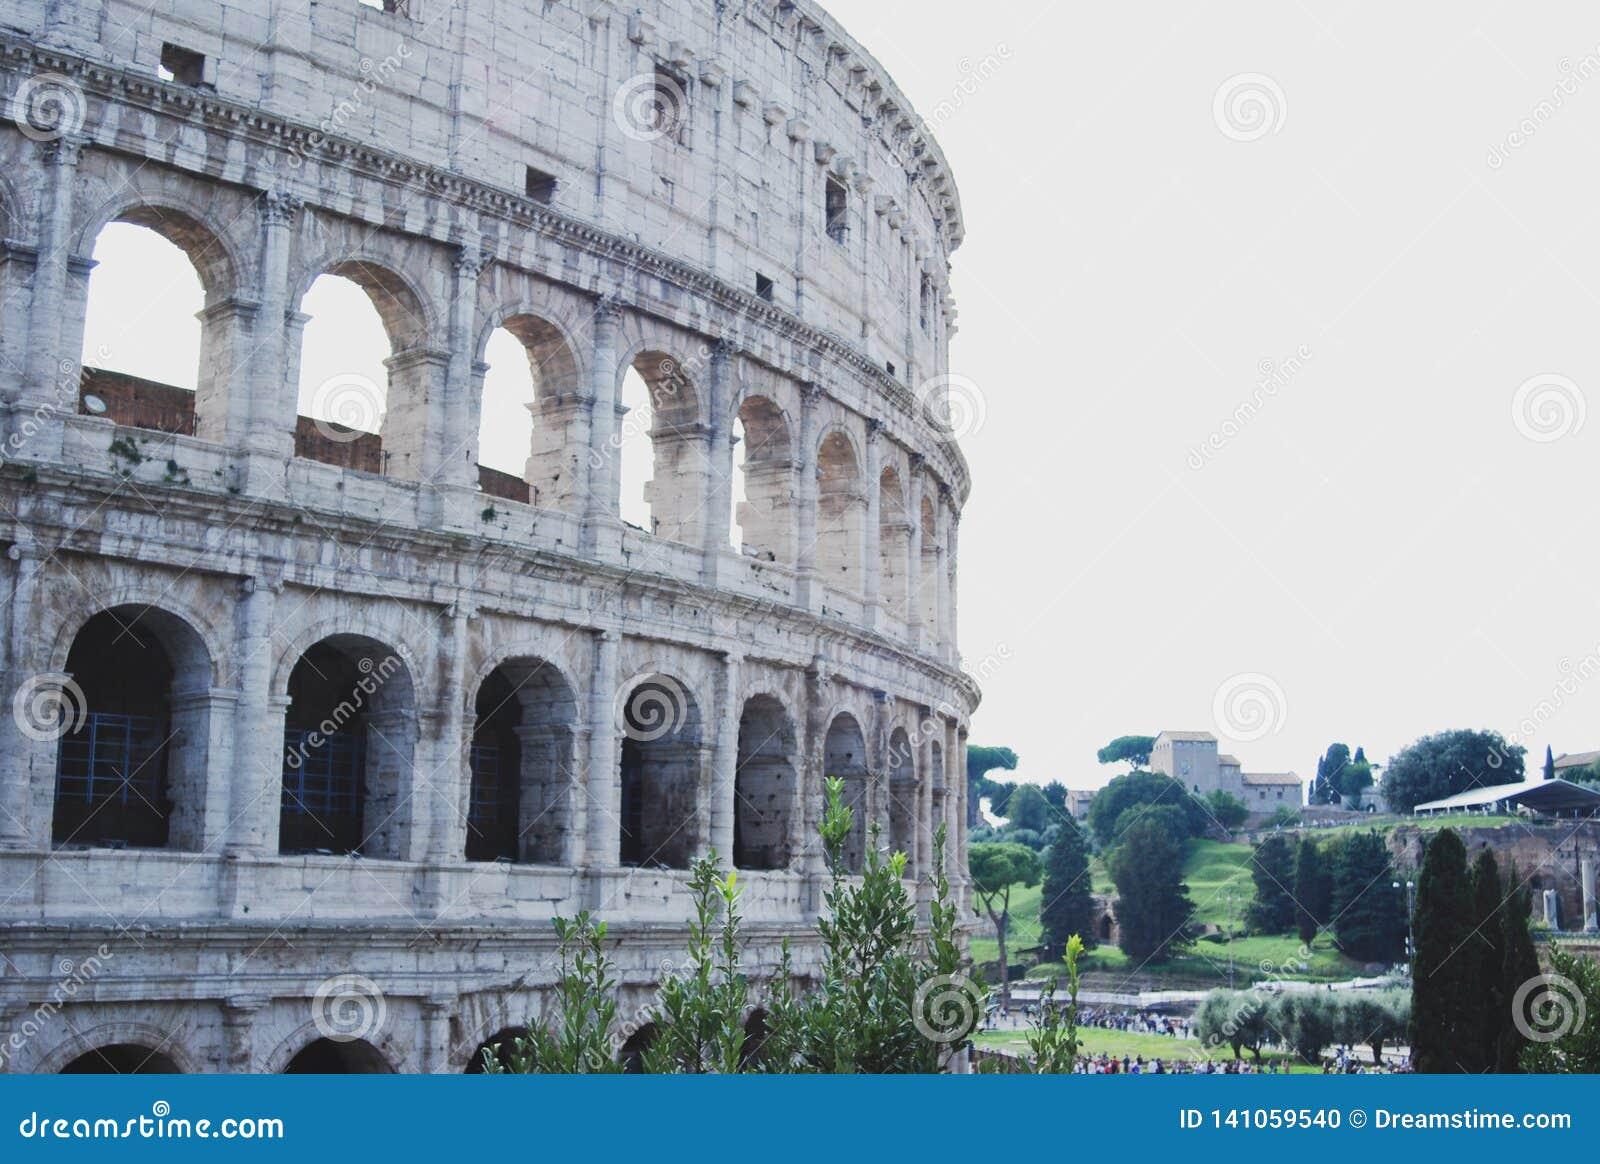 Colosseo colosseum Rome Italien